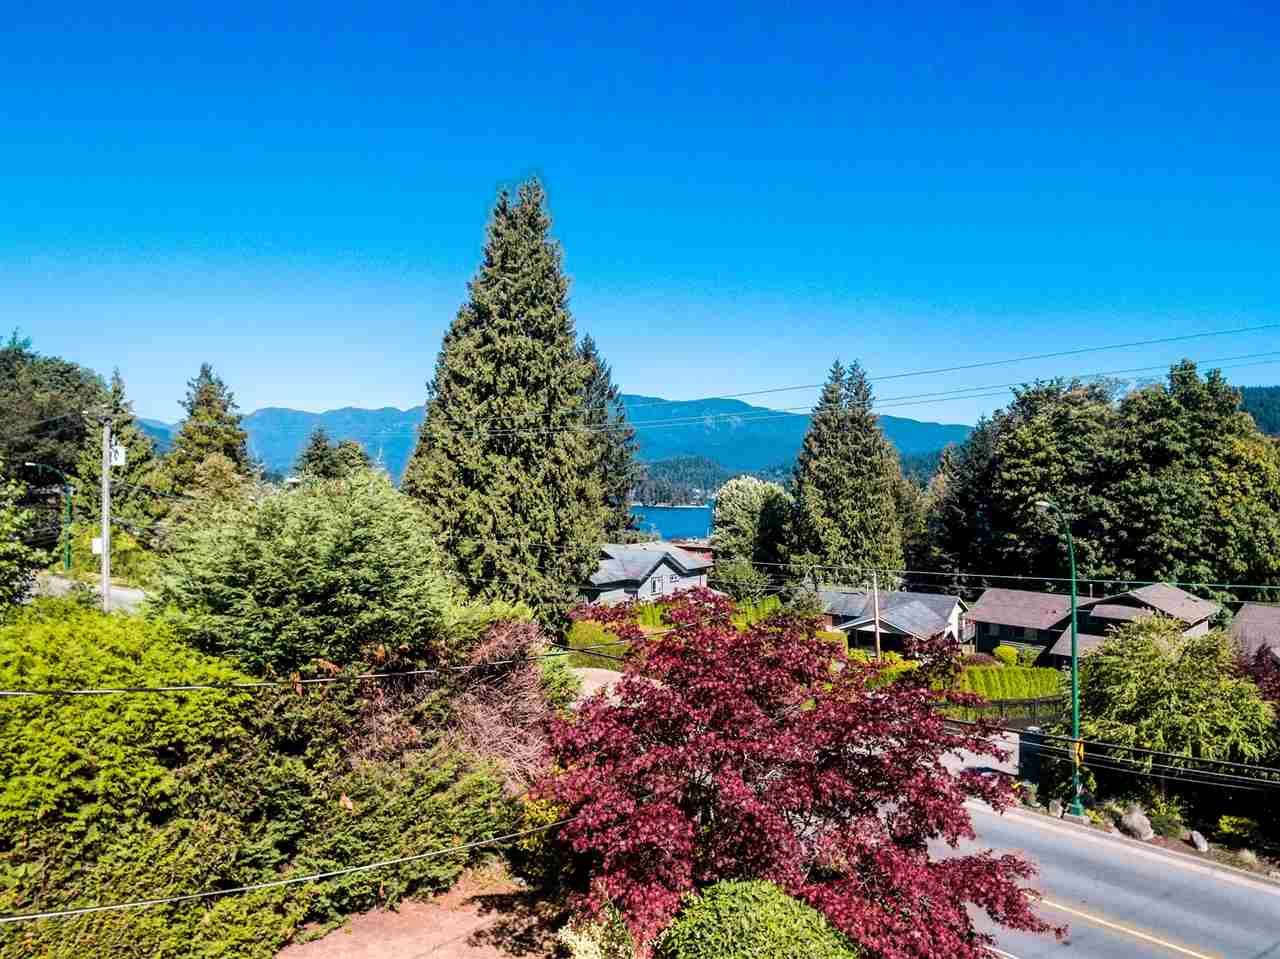 301 N DOLLARTON HIGHWAY, North Vancouver, BC, V7G 1M9 Photo 1